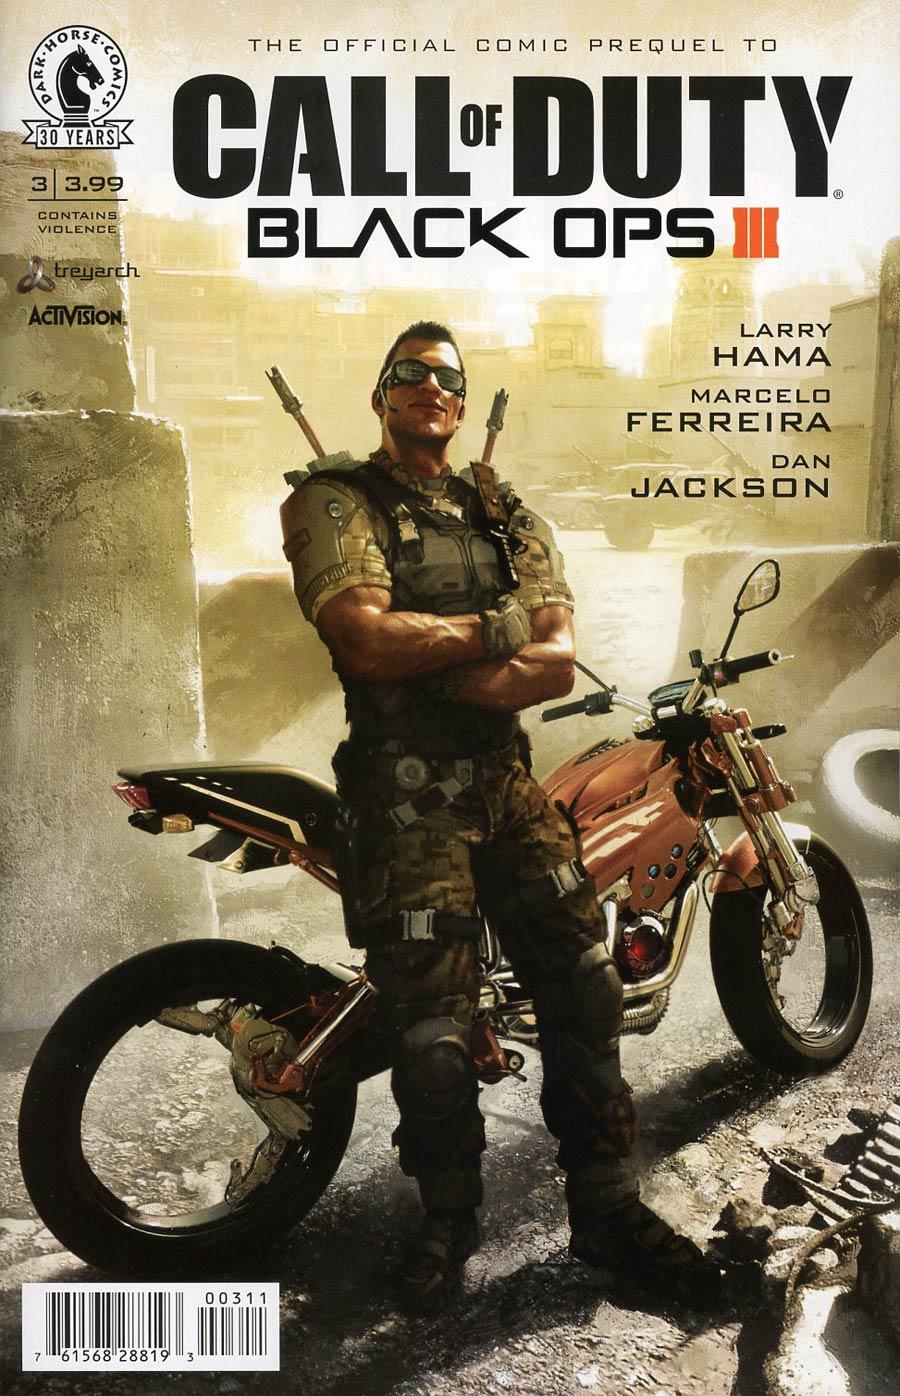 Call Of Duty Black Ops III #3